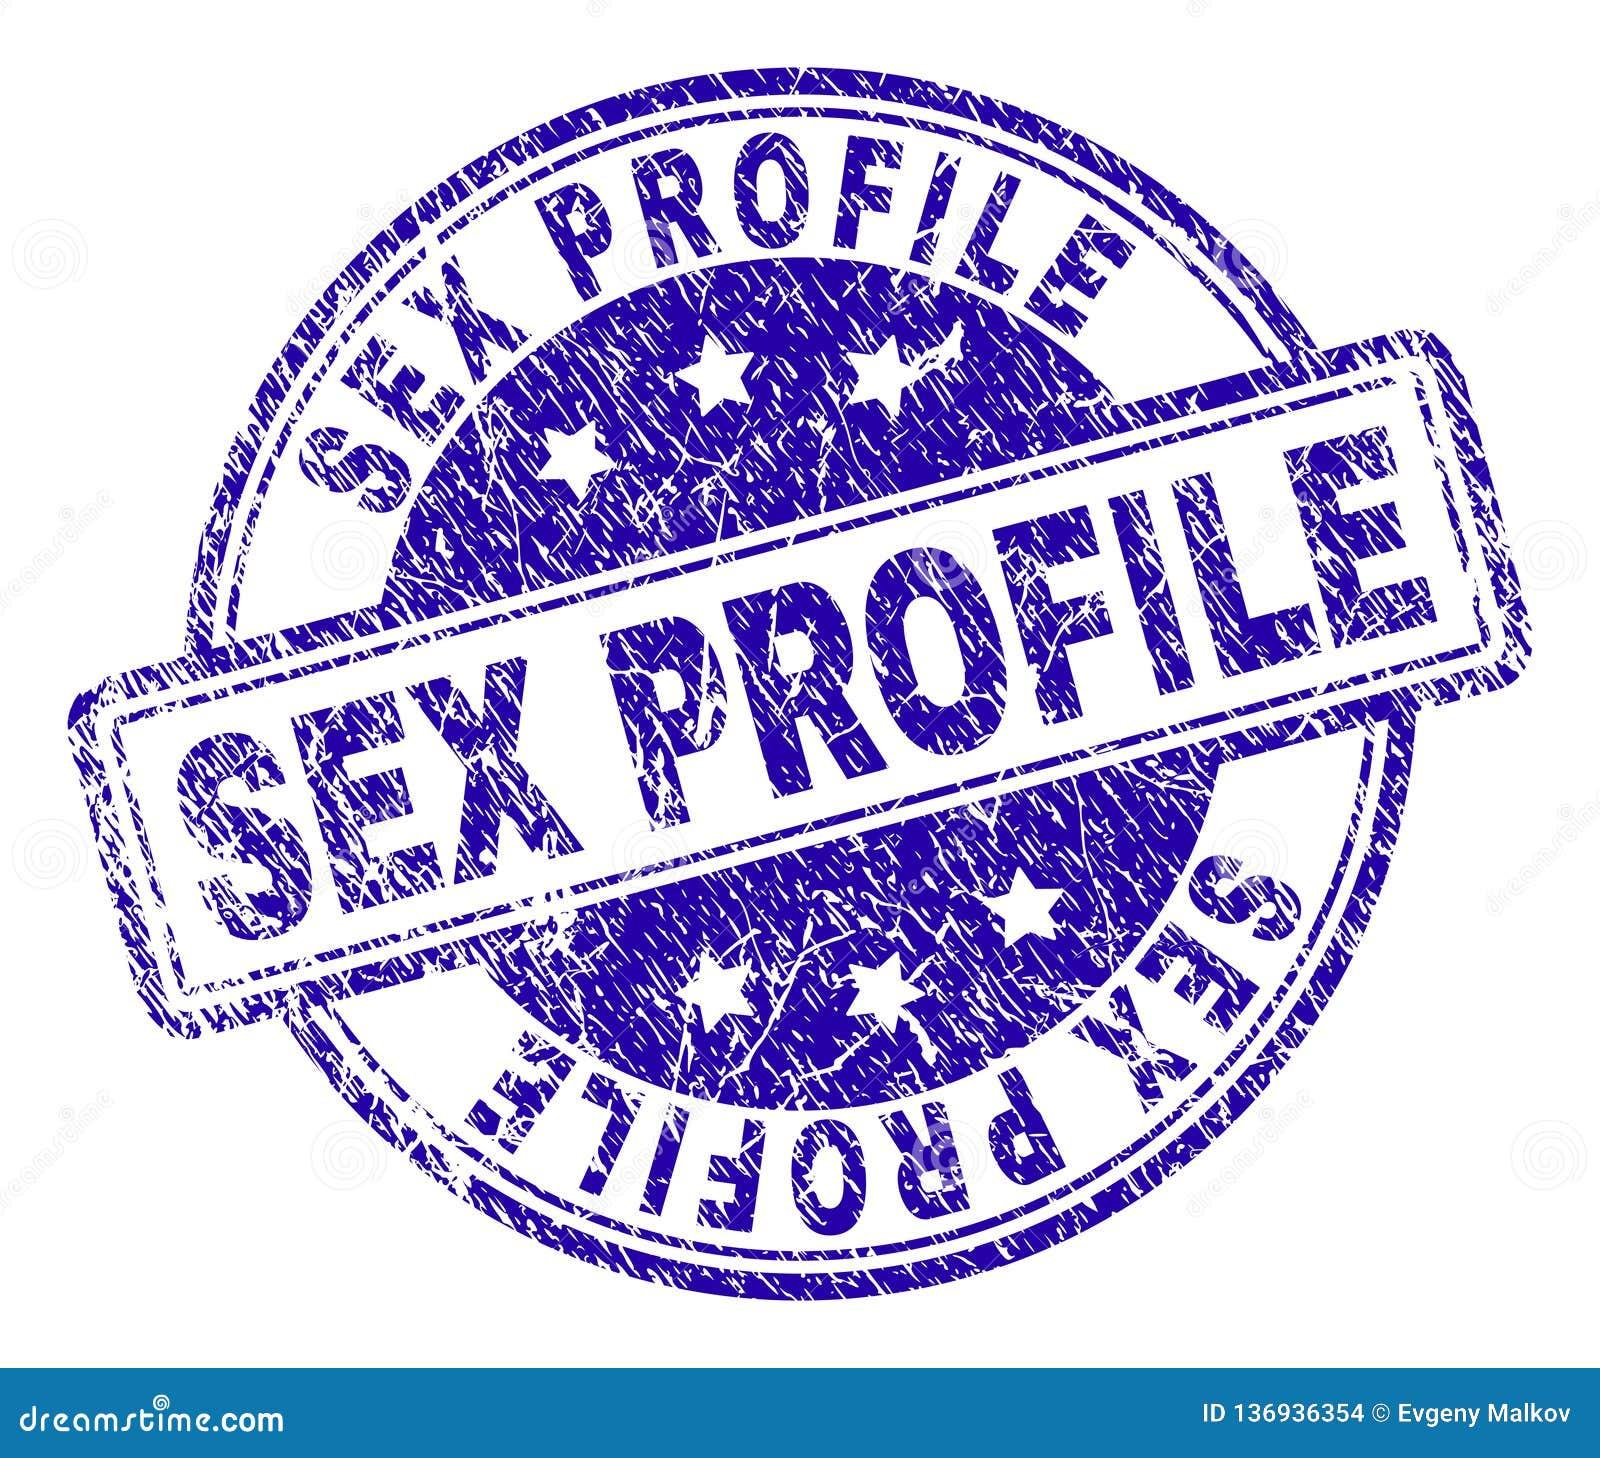 Sex profile sites free Free Sexting